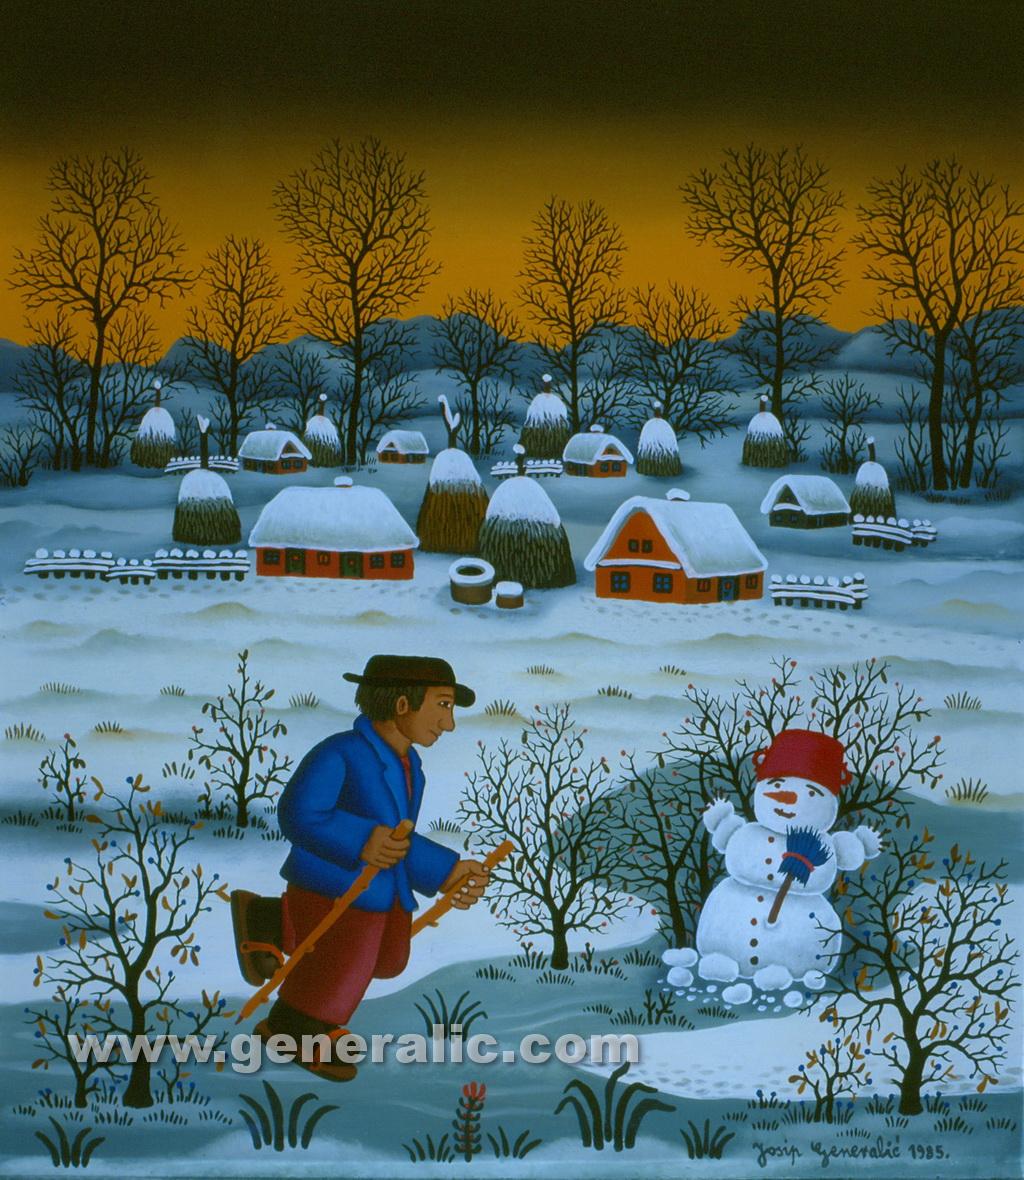 Josip Generalic, 1985, Skater and snowman, oil on glass